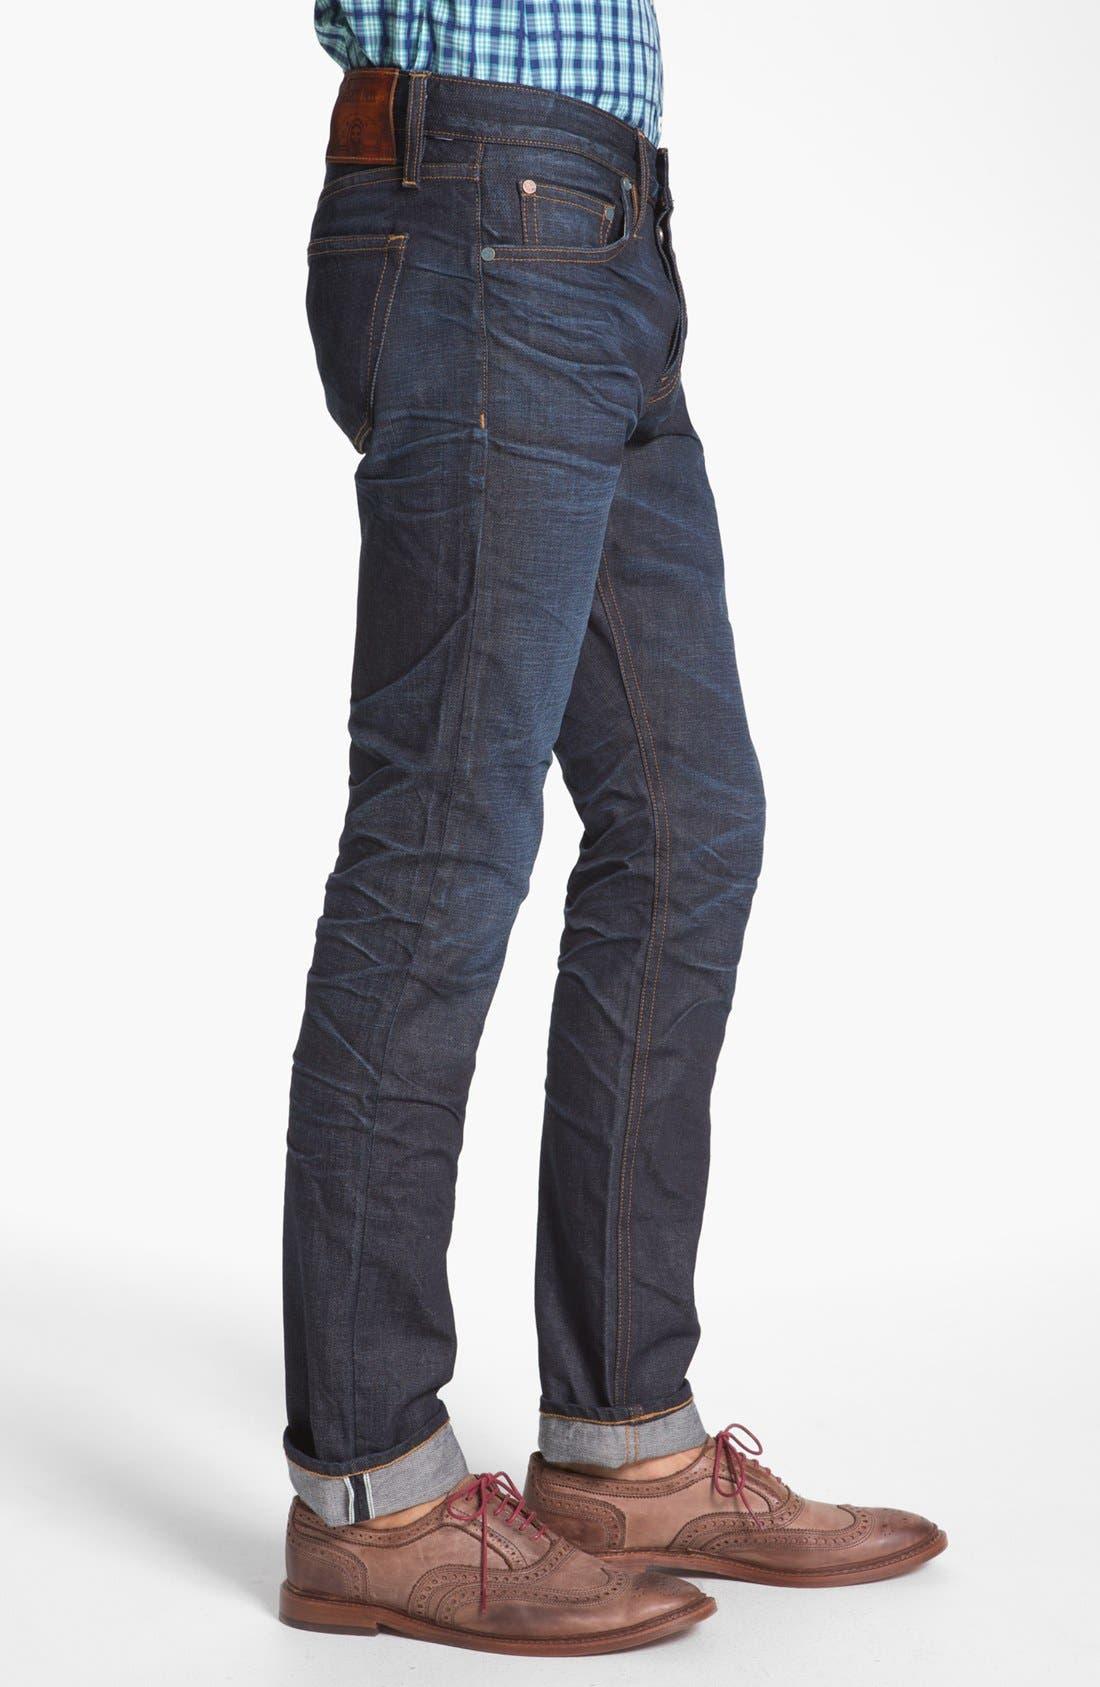 ASBURY PARK,                             '1888 Skinny Fit' Raw Selvedge Jeans,                             Alternate thumbnail 3, color,                             401